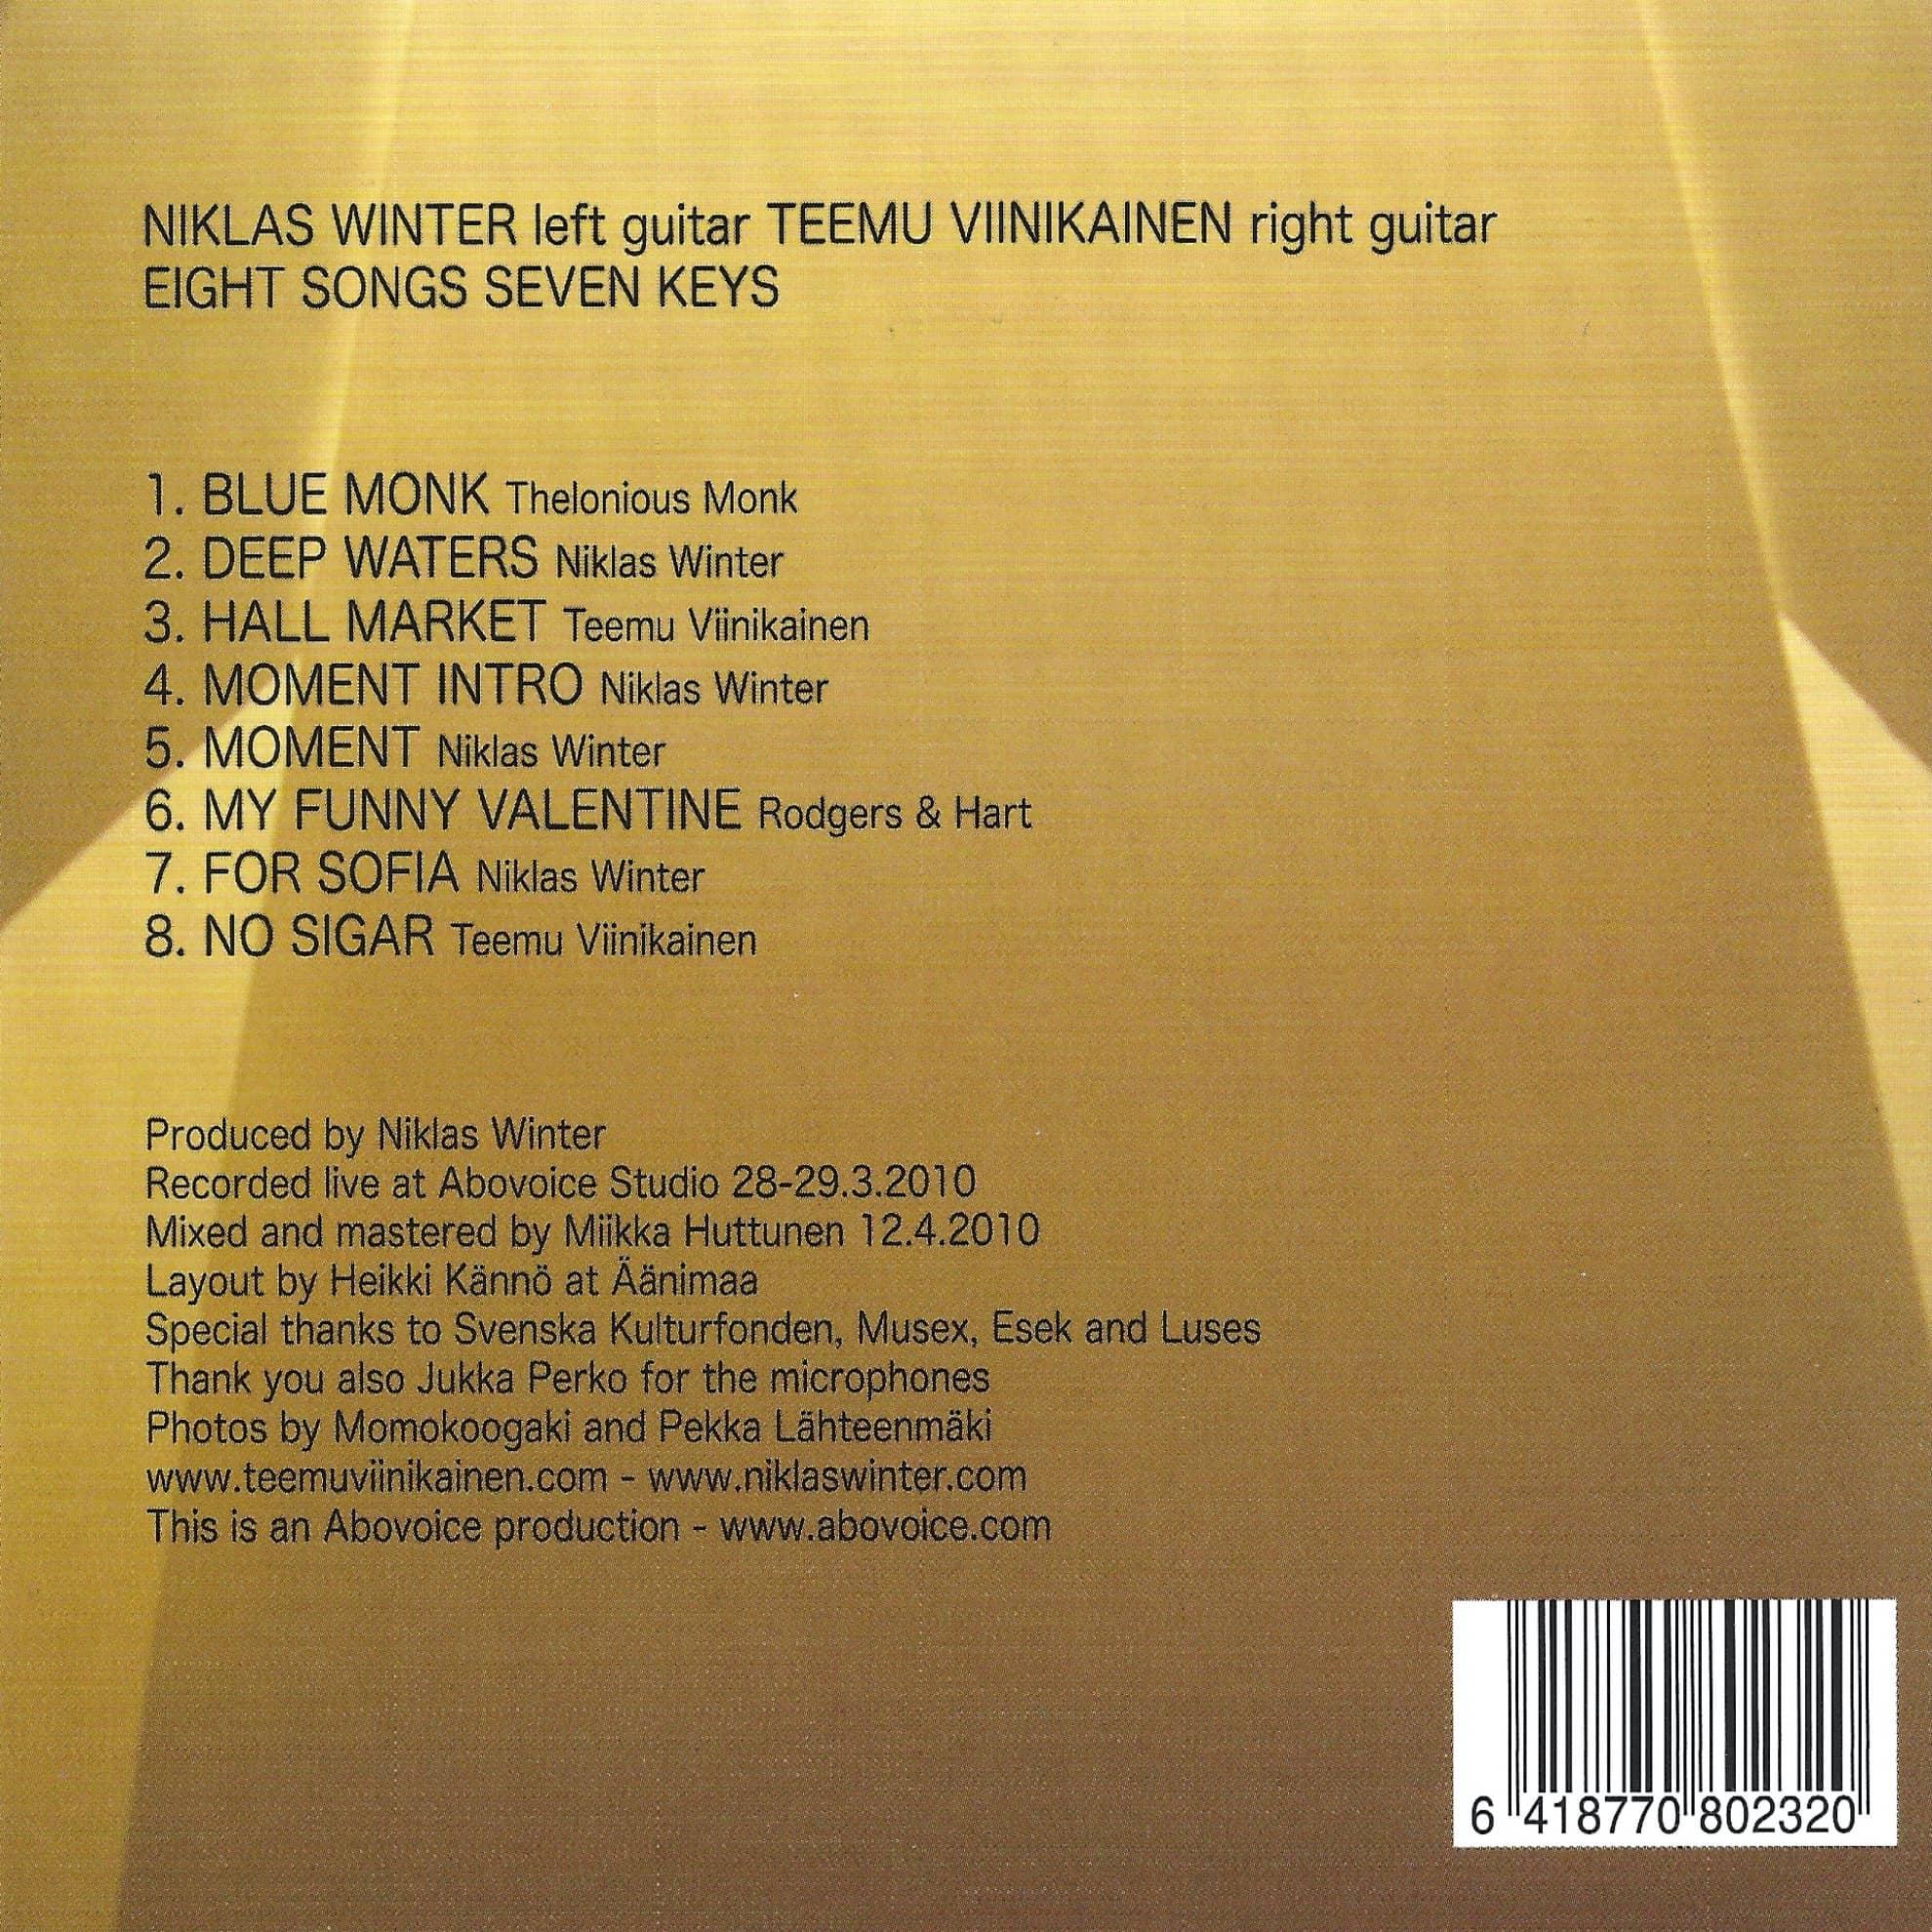 Eight Songs Seven Keys back cover (1980x1980)